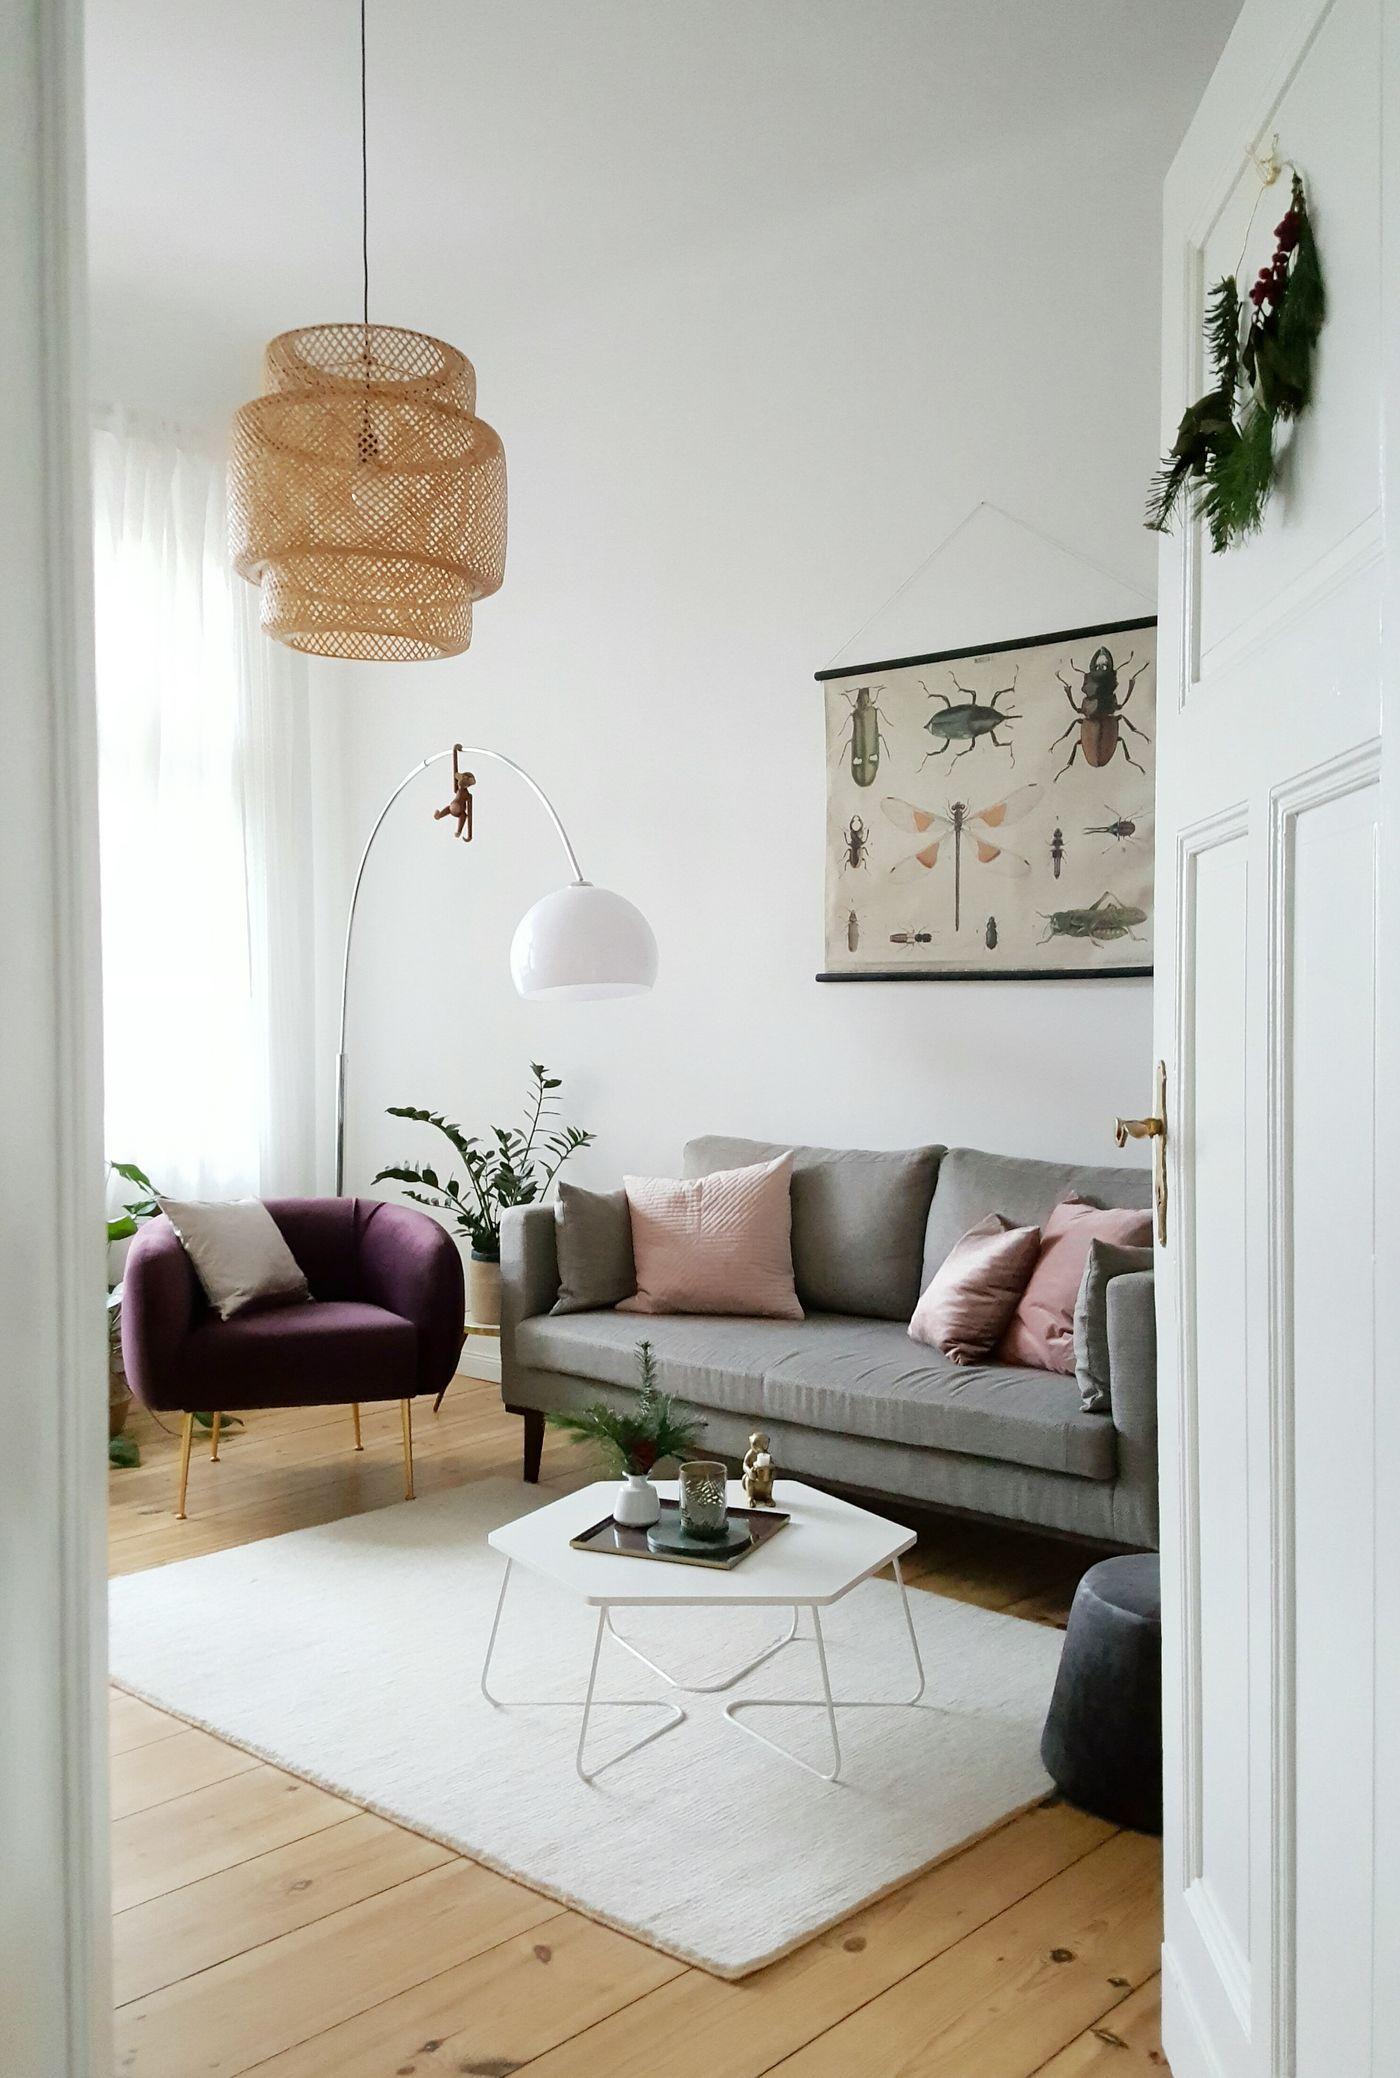 Skandinavisch Wohnzimmer Lampe – Caseconrad.com